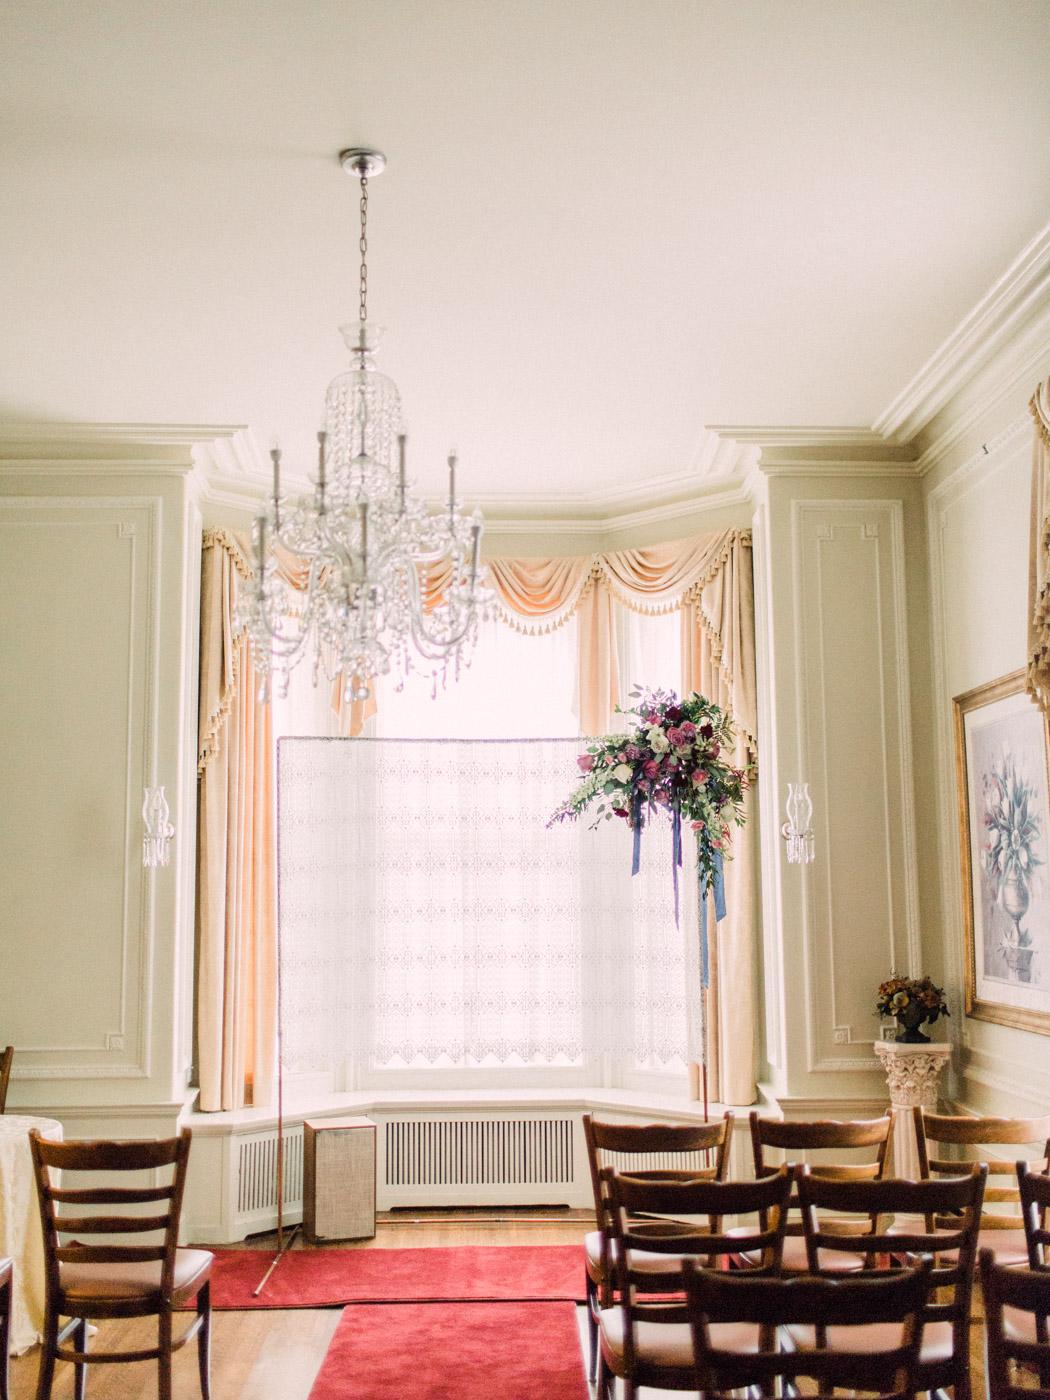 Toronto-wedding-photographer-intimate-classic-fine-art-elopement-ottawa12.jpg